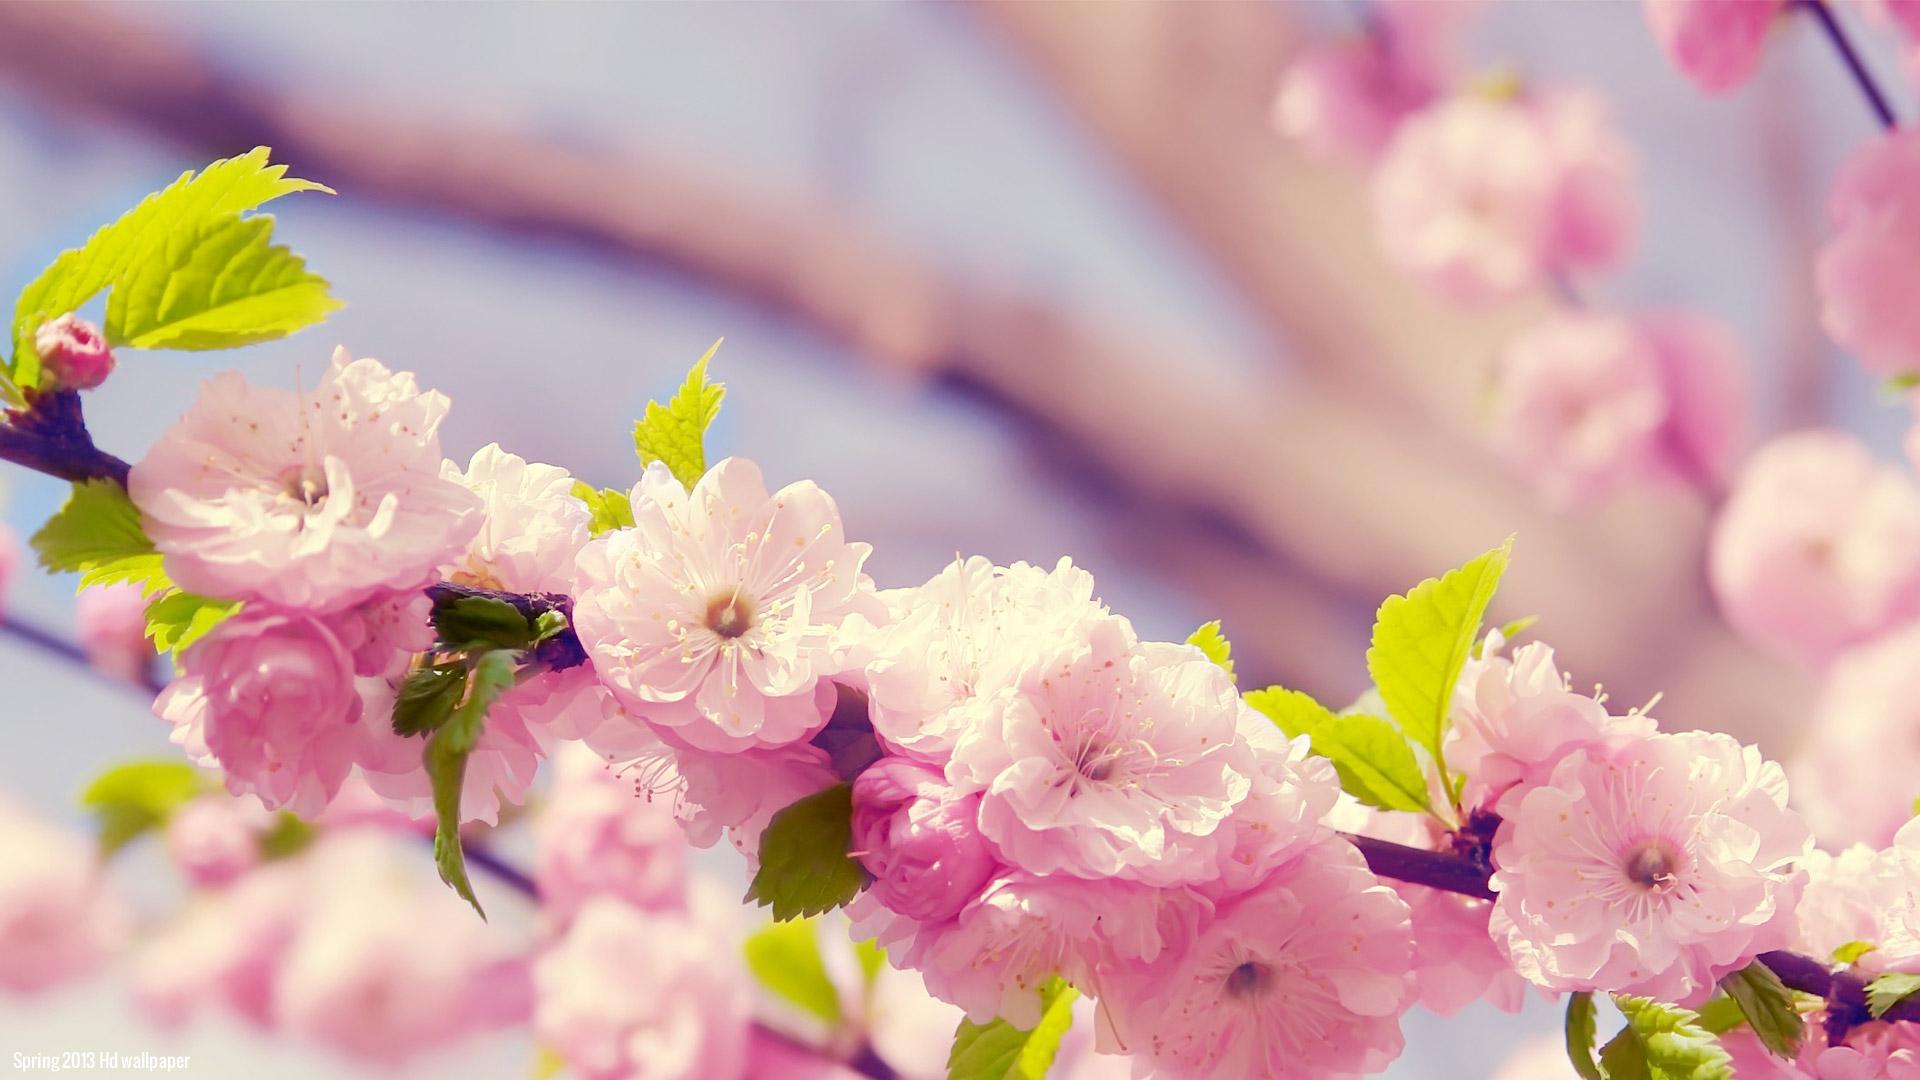 Spring flowers Full HD wallpaper 1920x1080